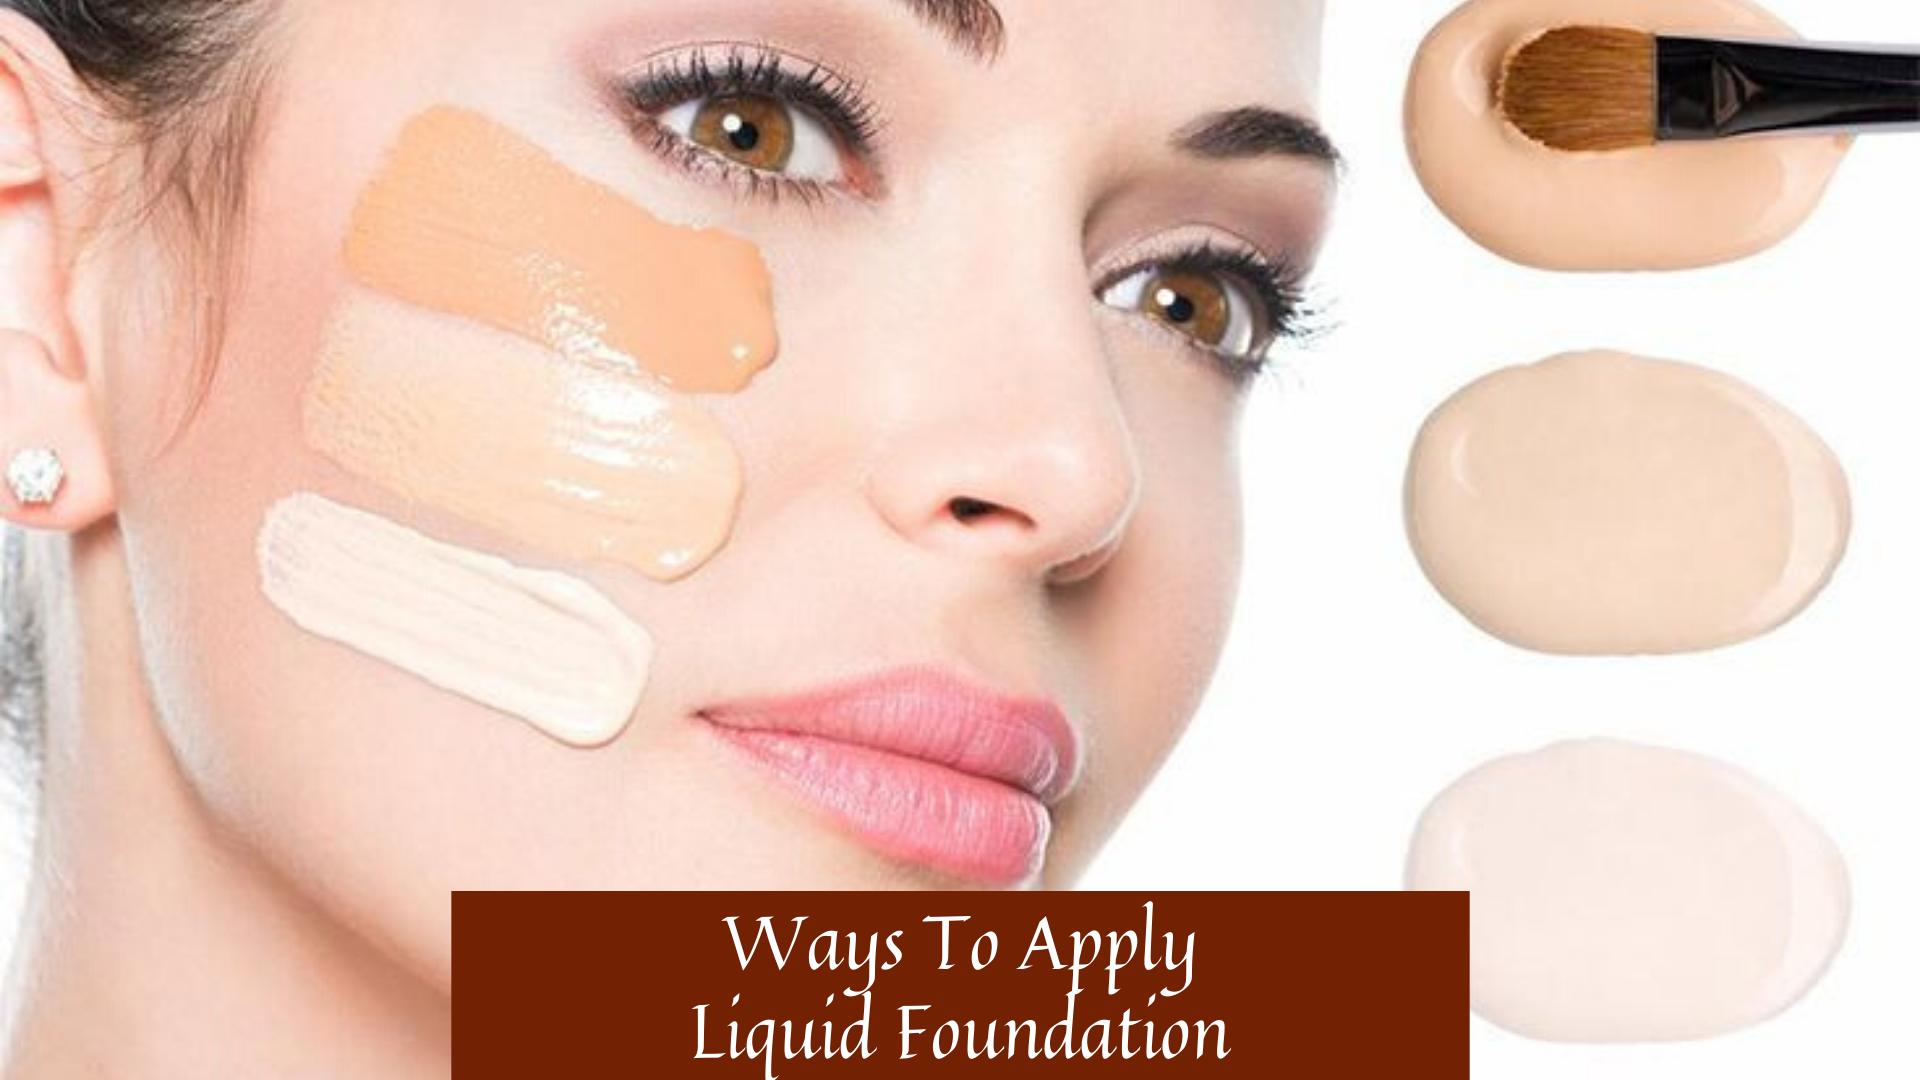 Ways To Apply Liquid Foundation  Liquid foundation, Best makeup